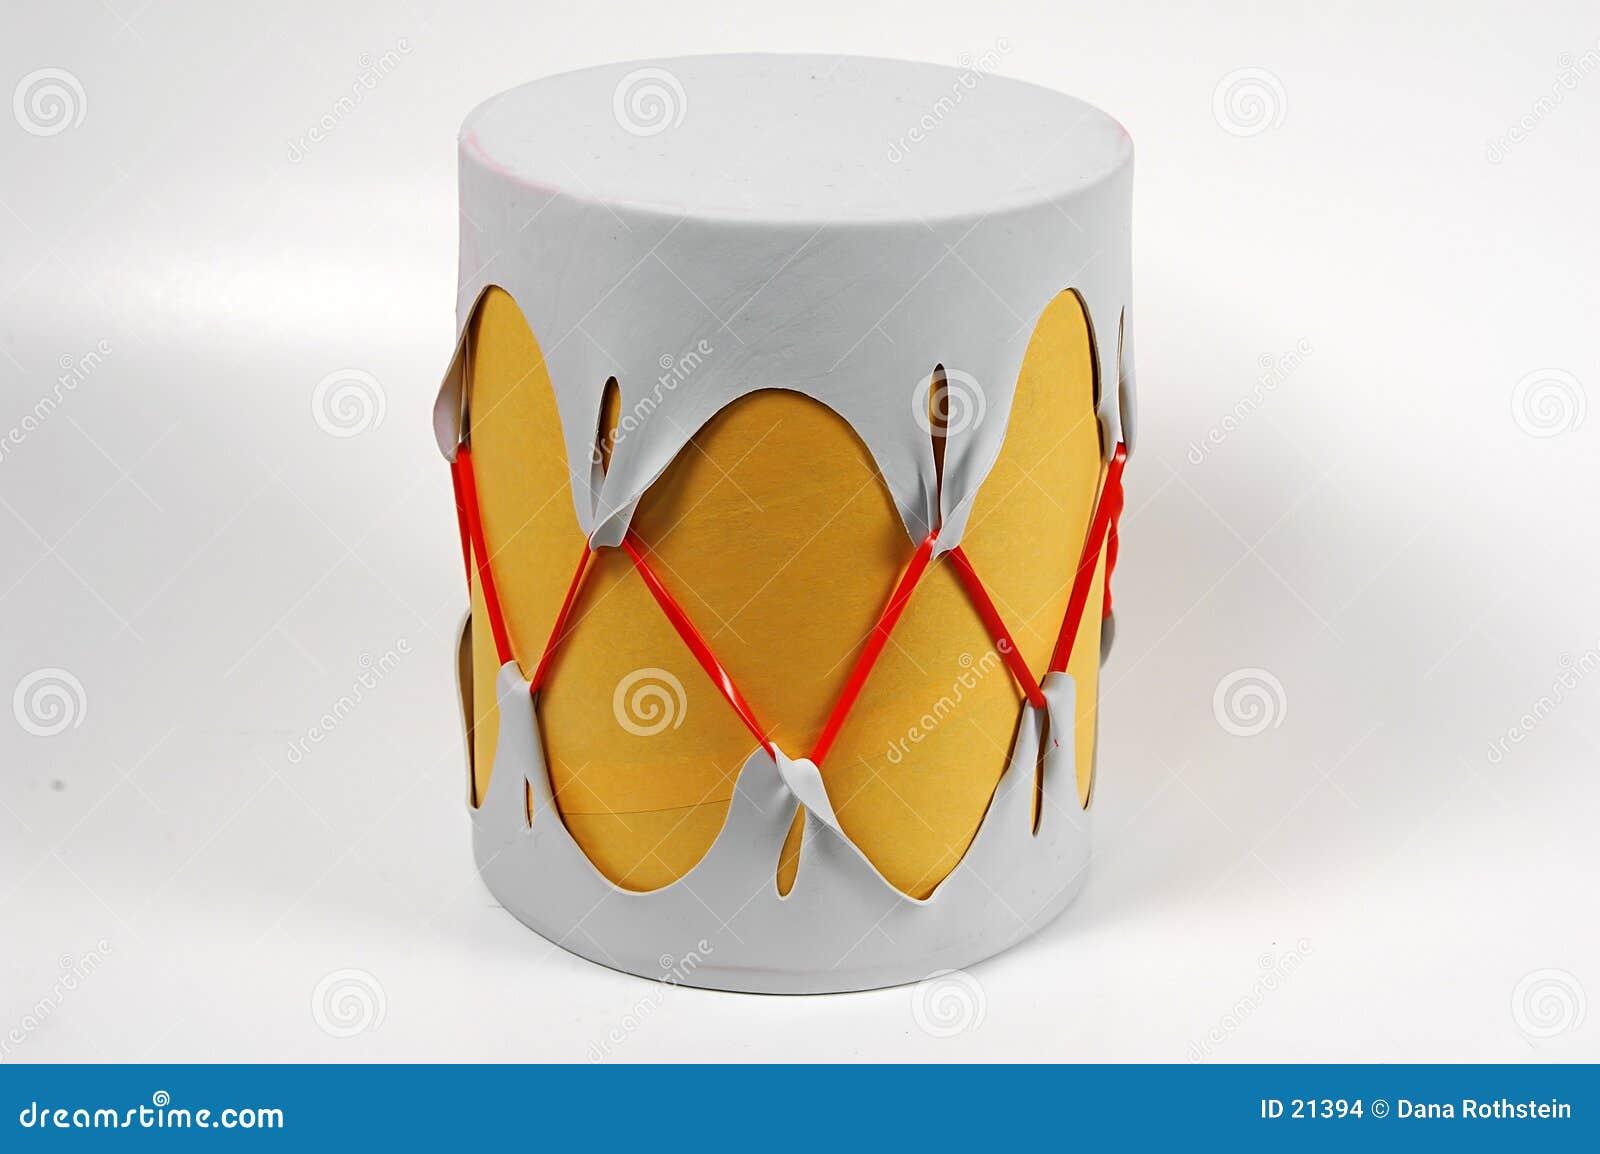 Toy Indian Drum